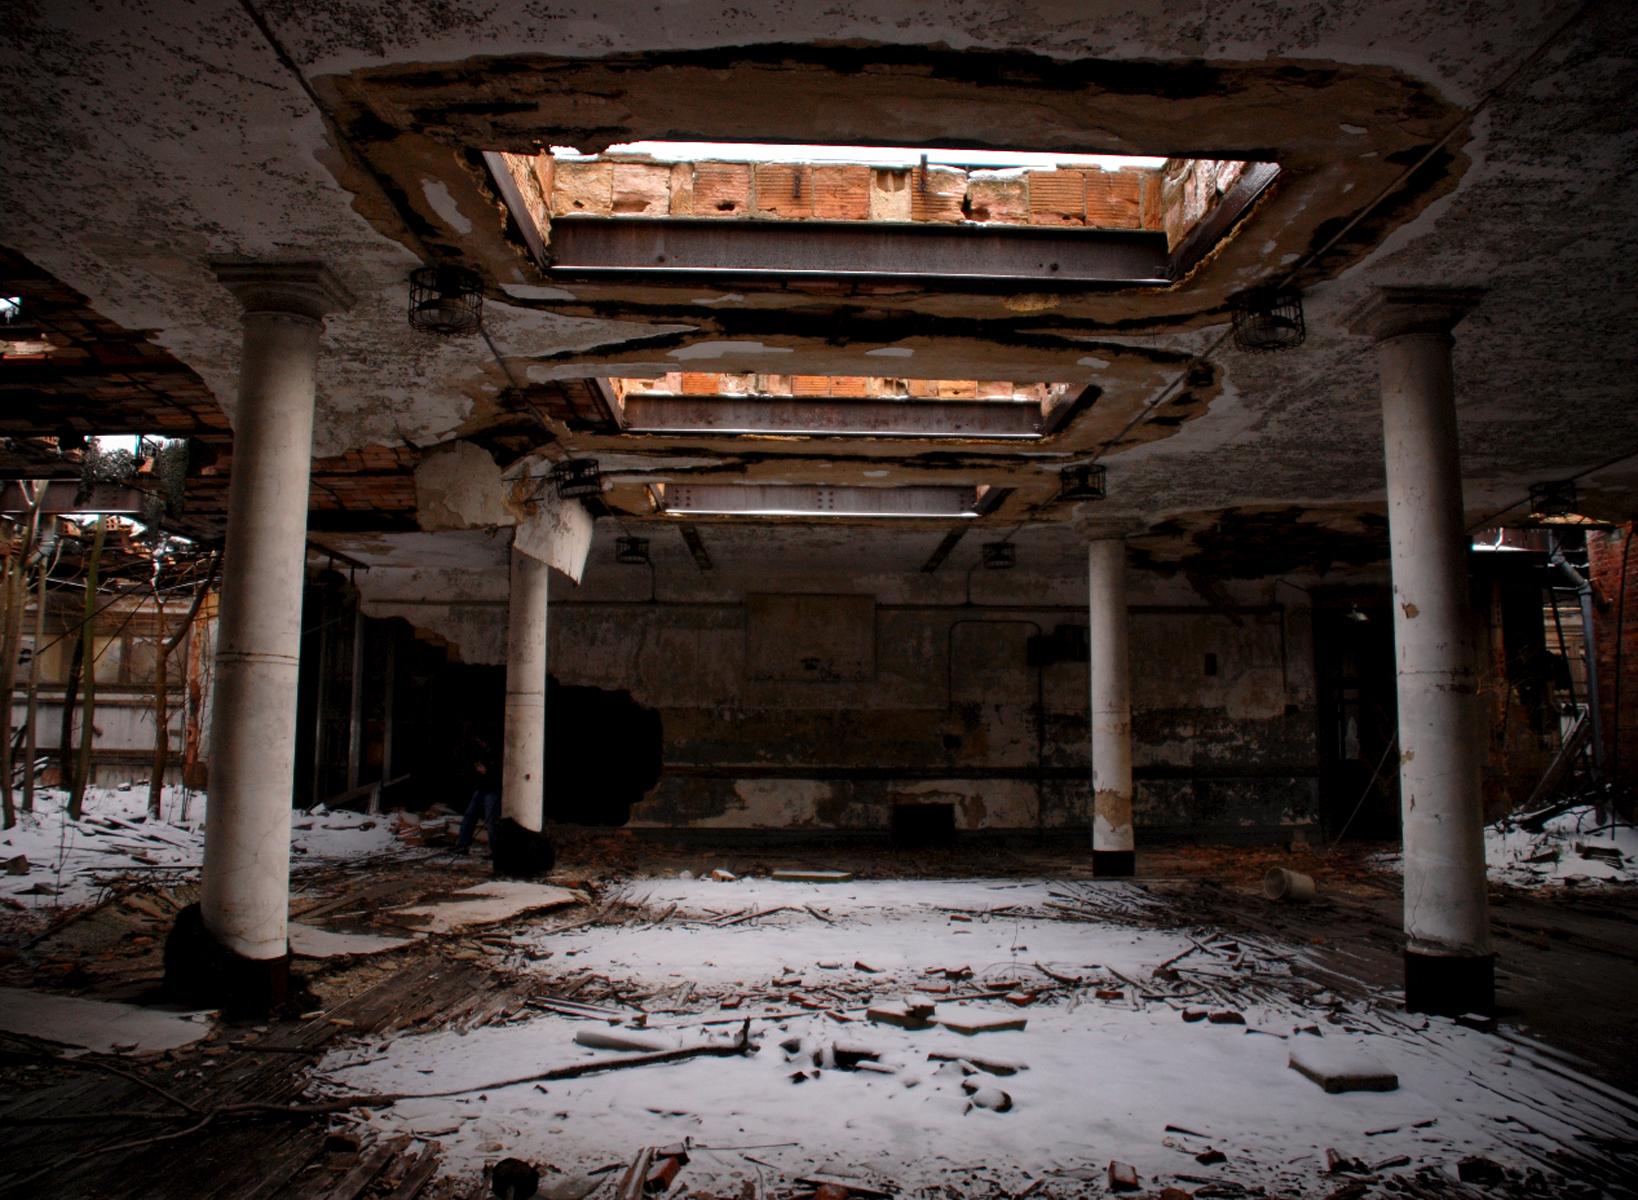 Kensinger S Abandoned City Wink Magazine Blog